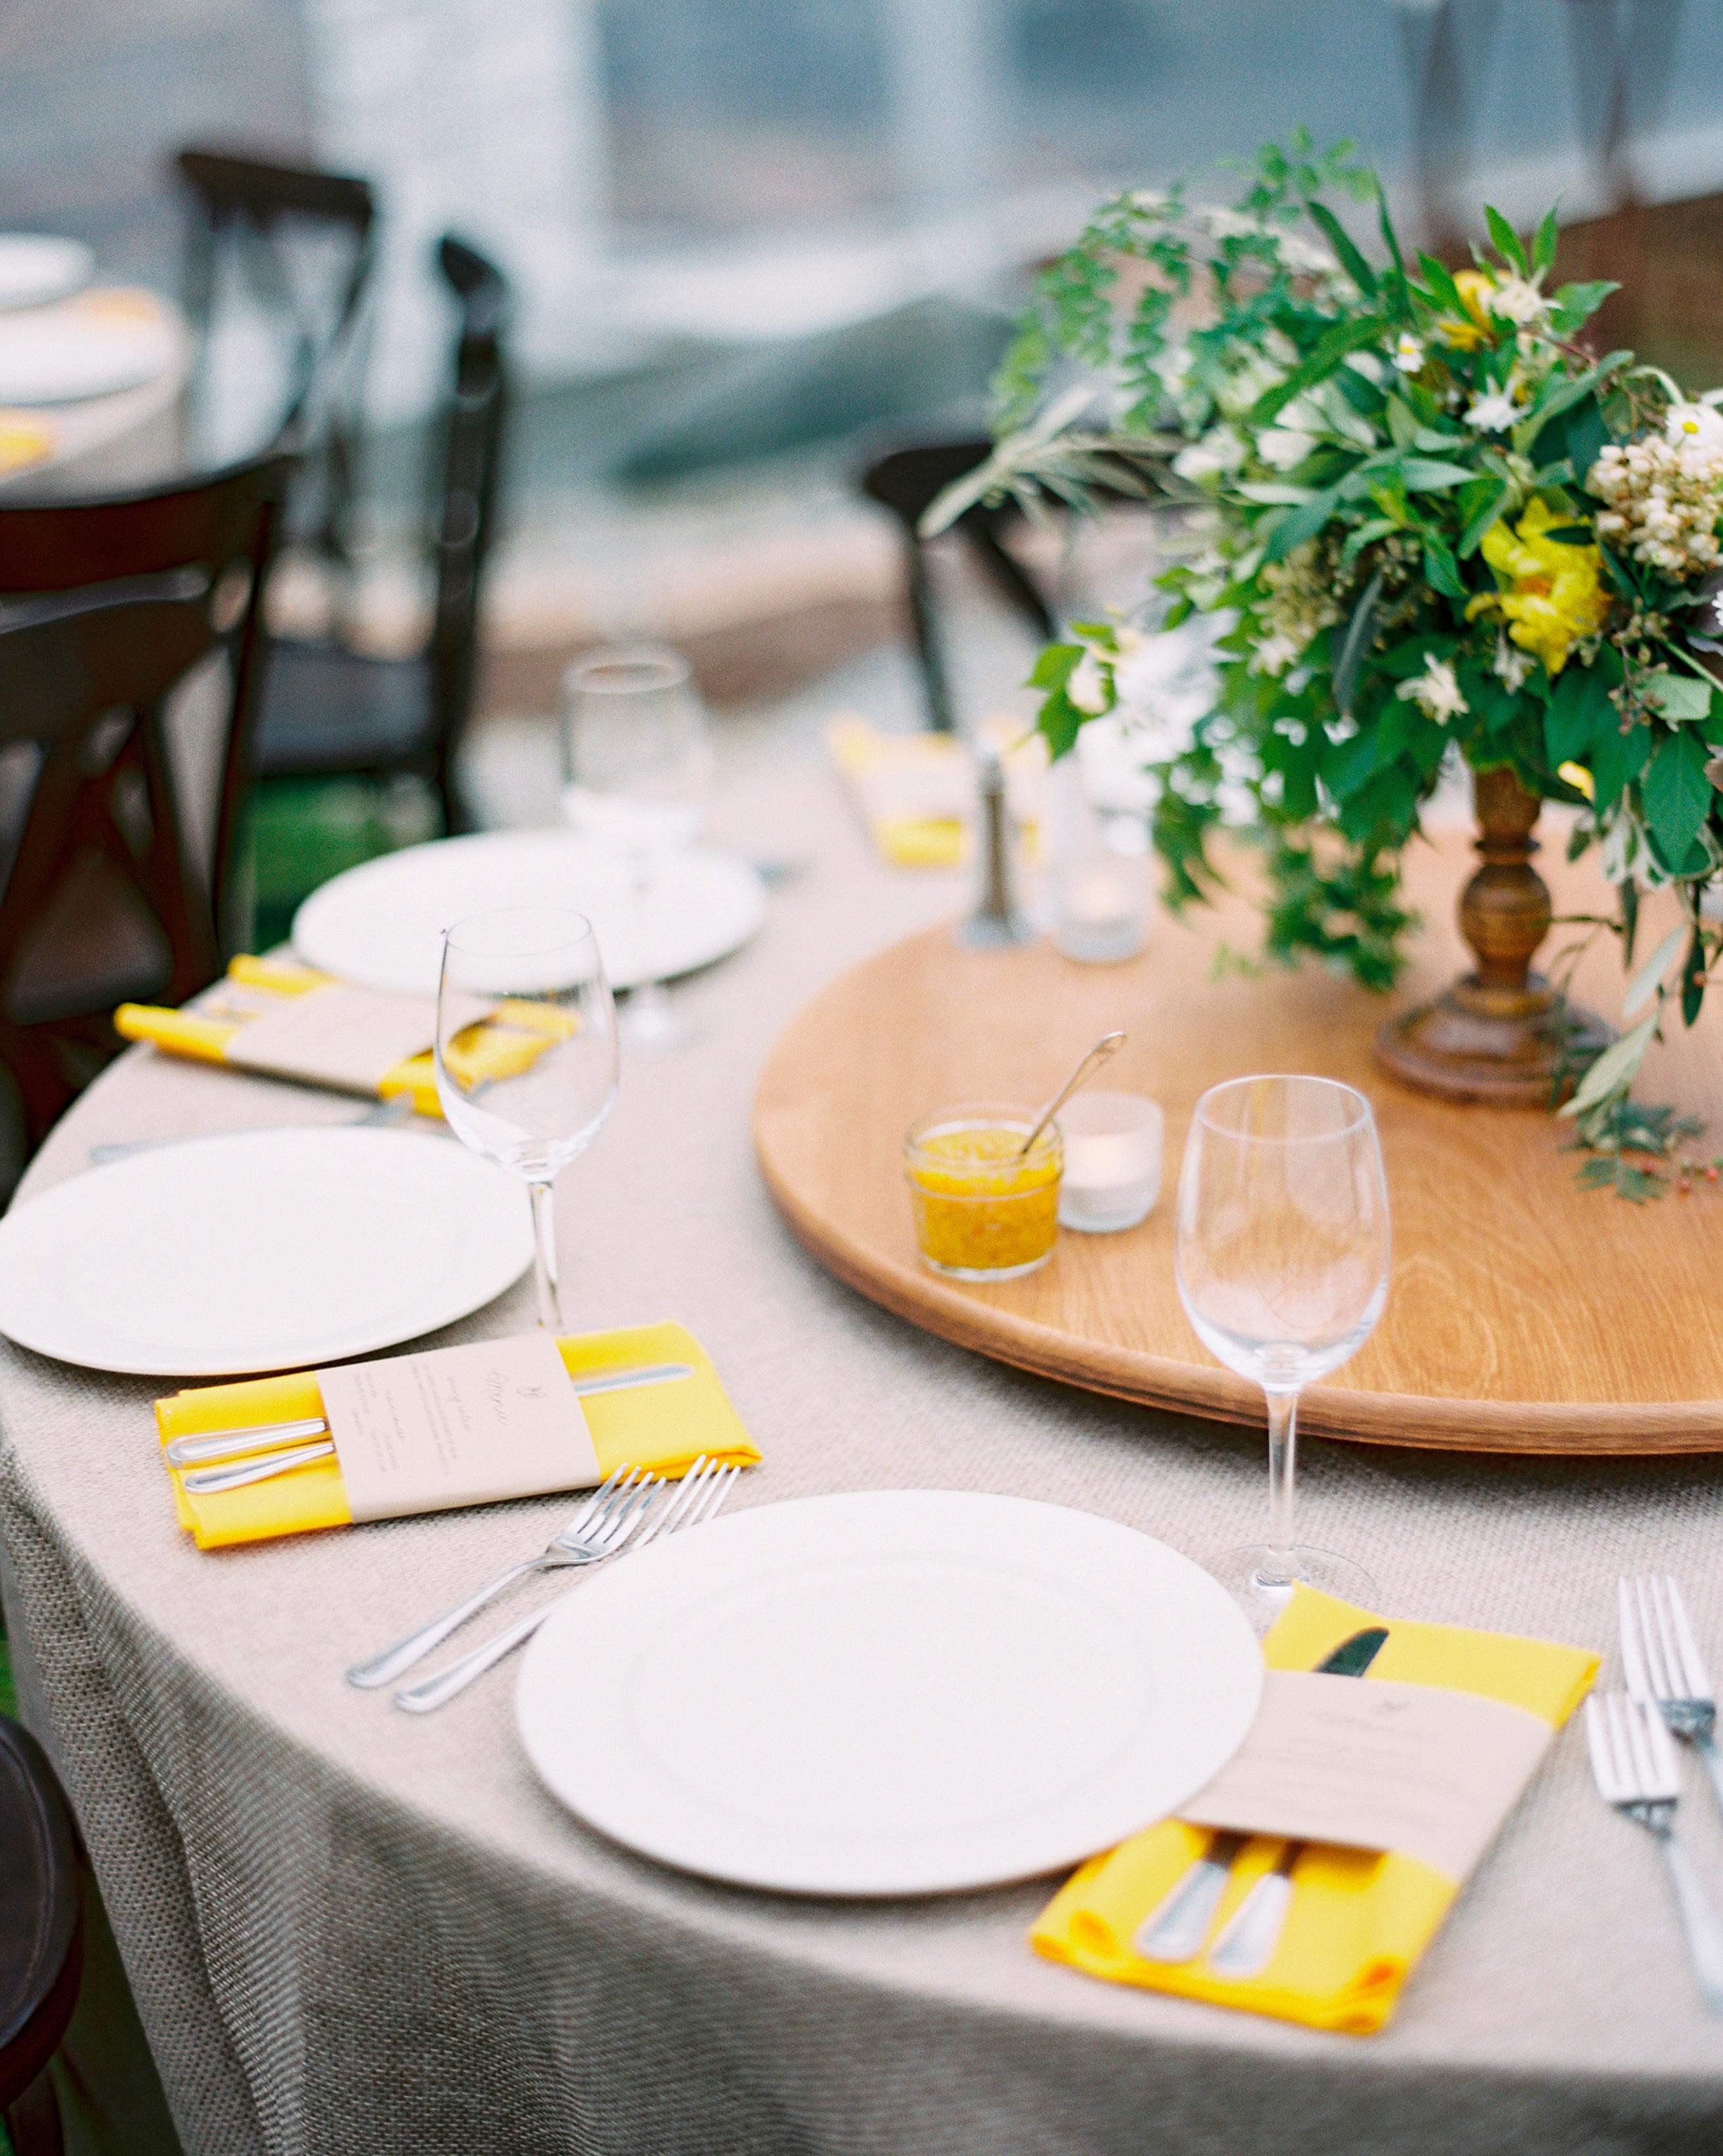 susan-cartter-wedding-table-008438006-s111503-0914.jpg